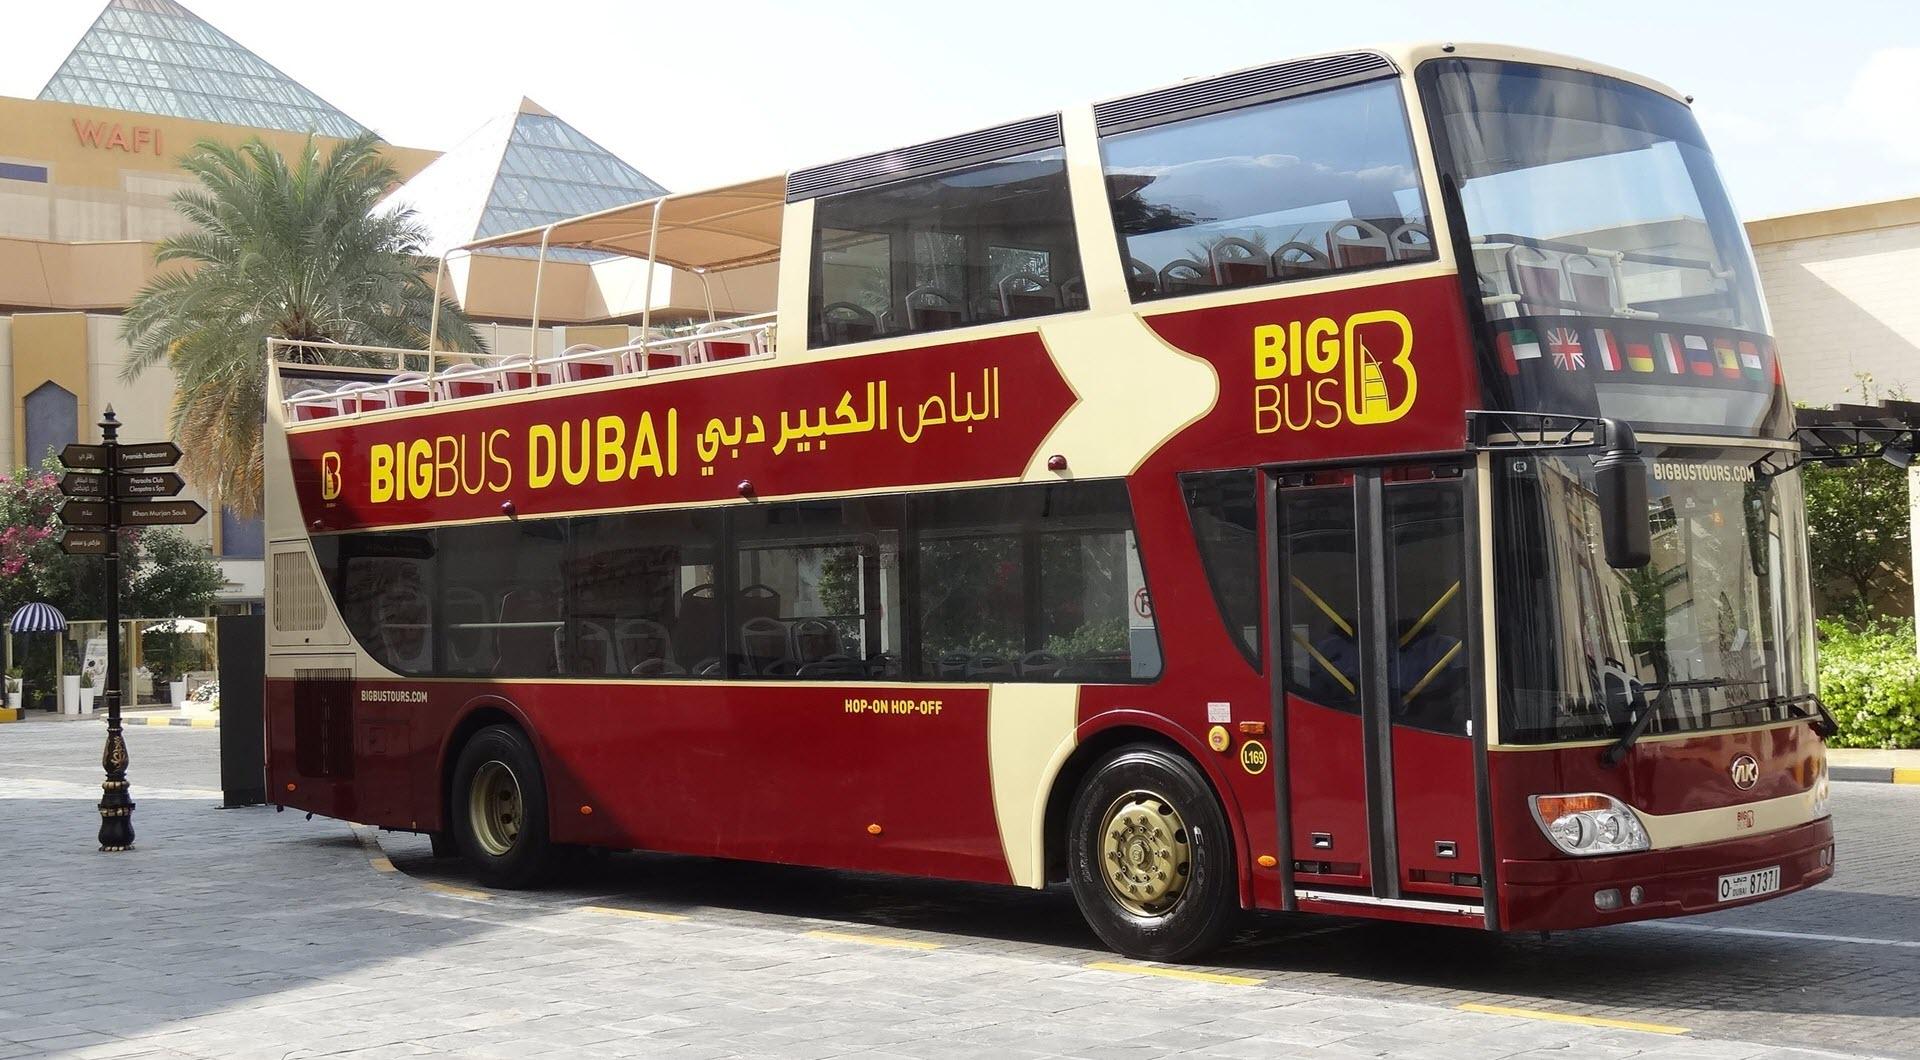 UBL TRAVELS DUBAI